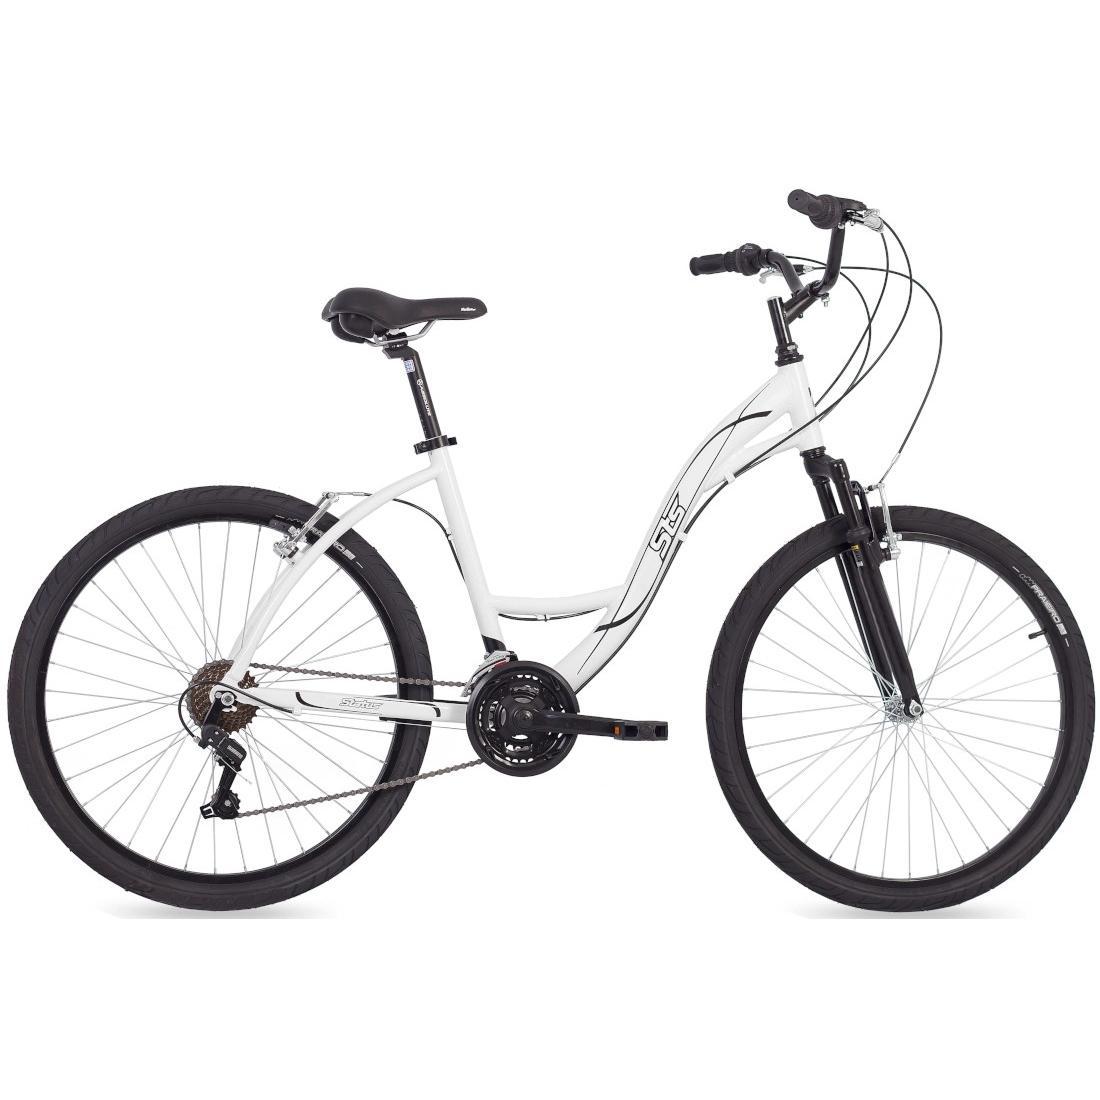 Bicicleta Aro Aero 26 Alumínio 21V Shimano Suspensão Urbana Branca